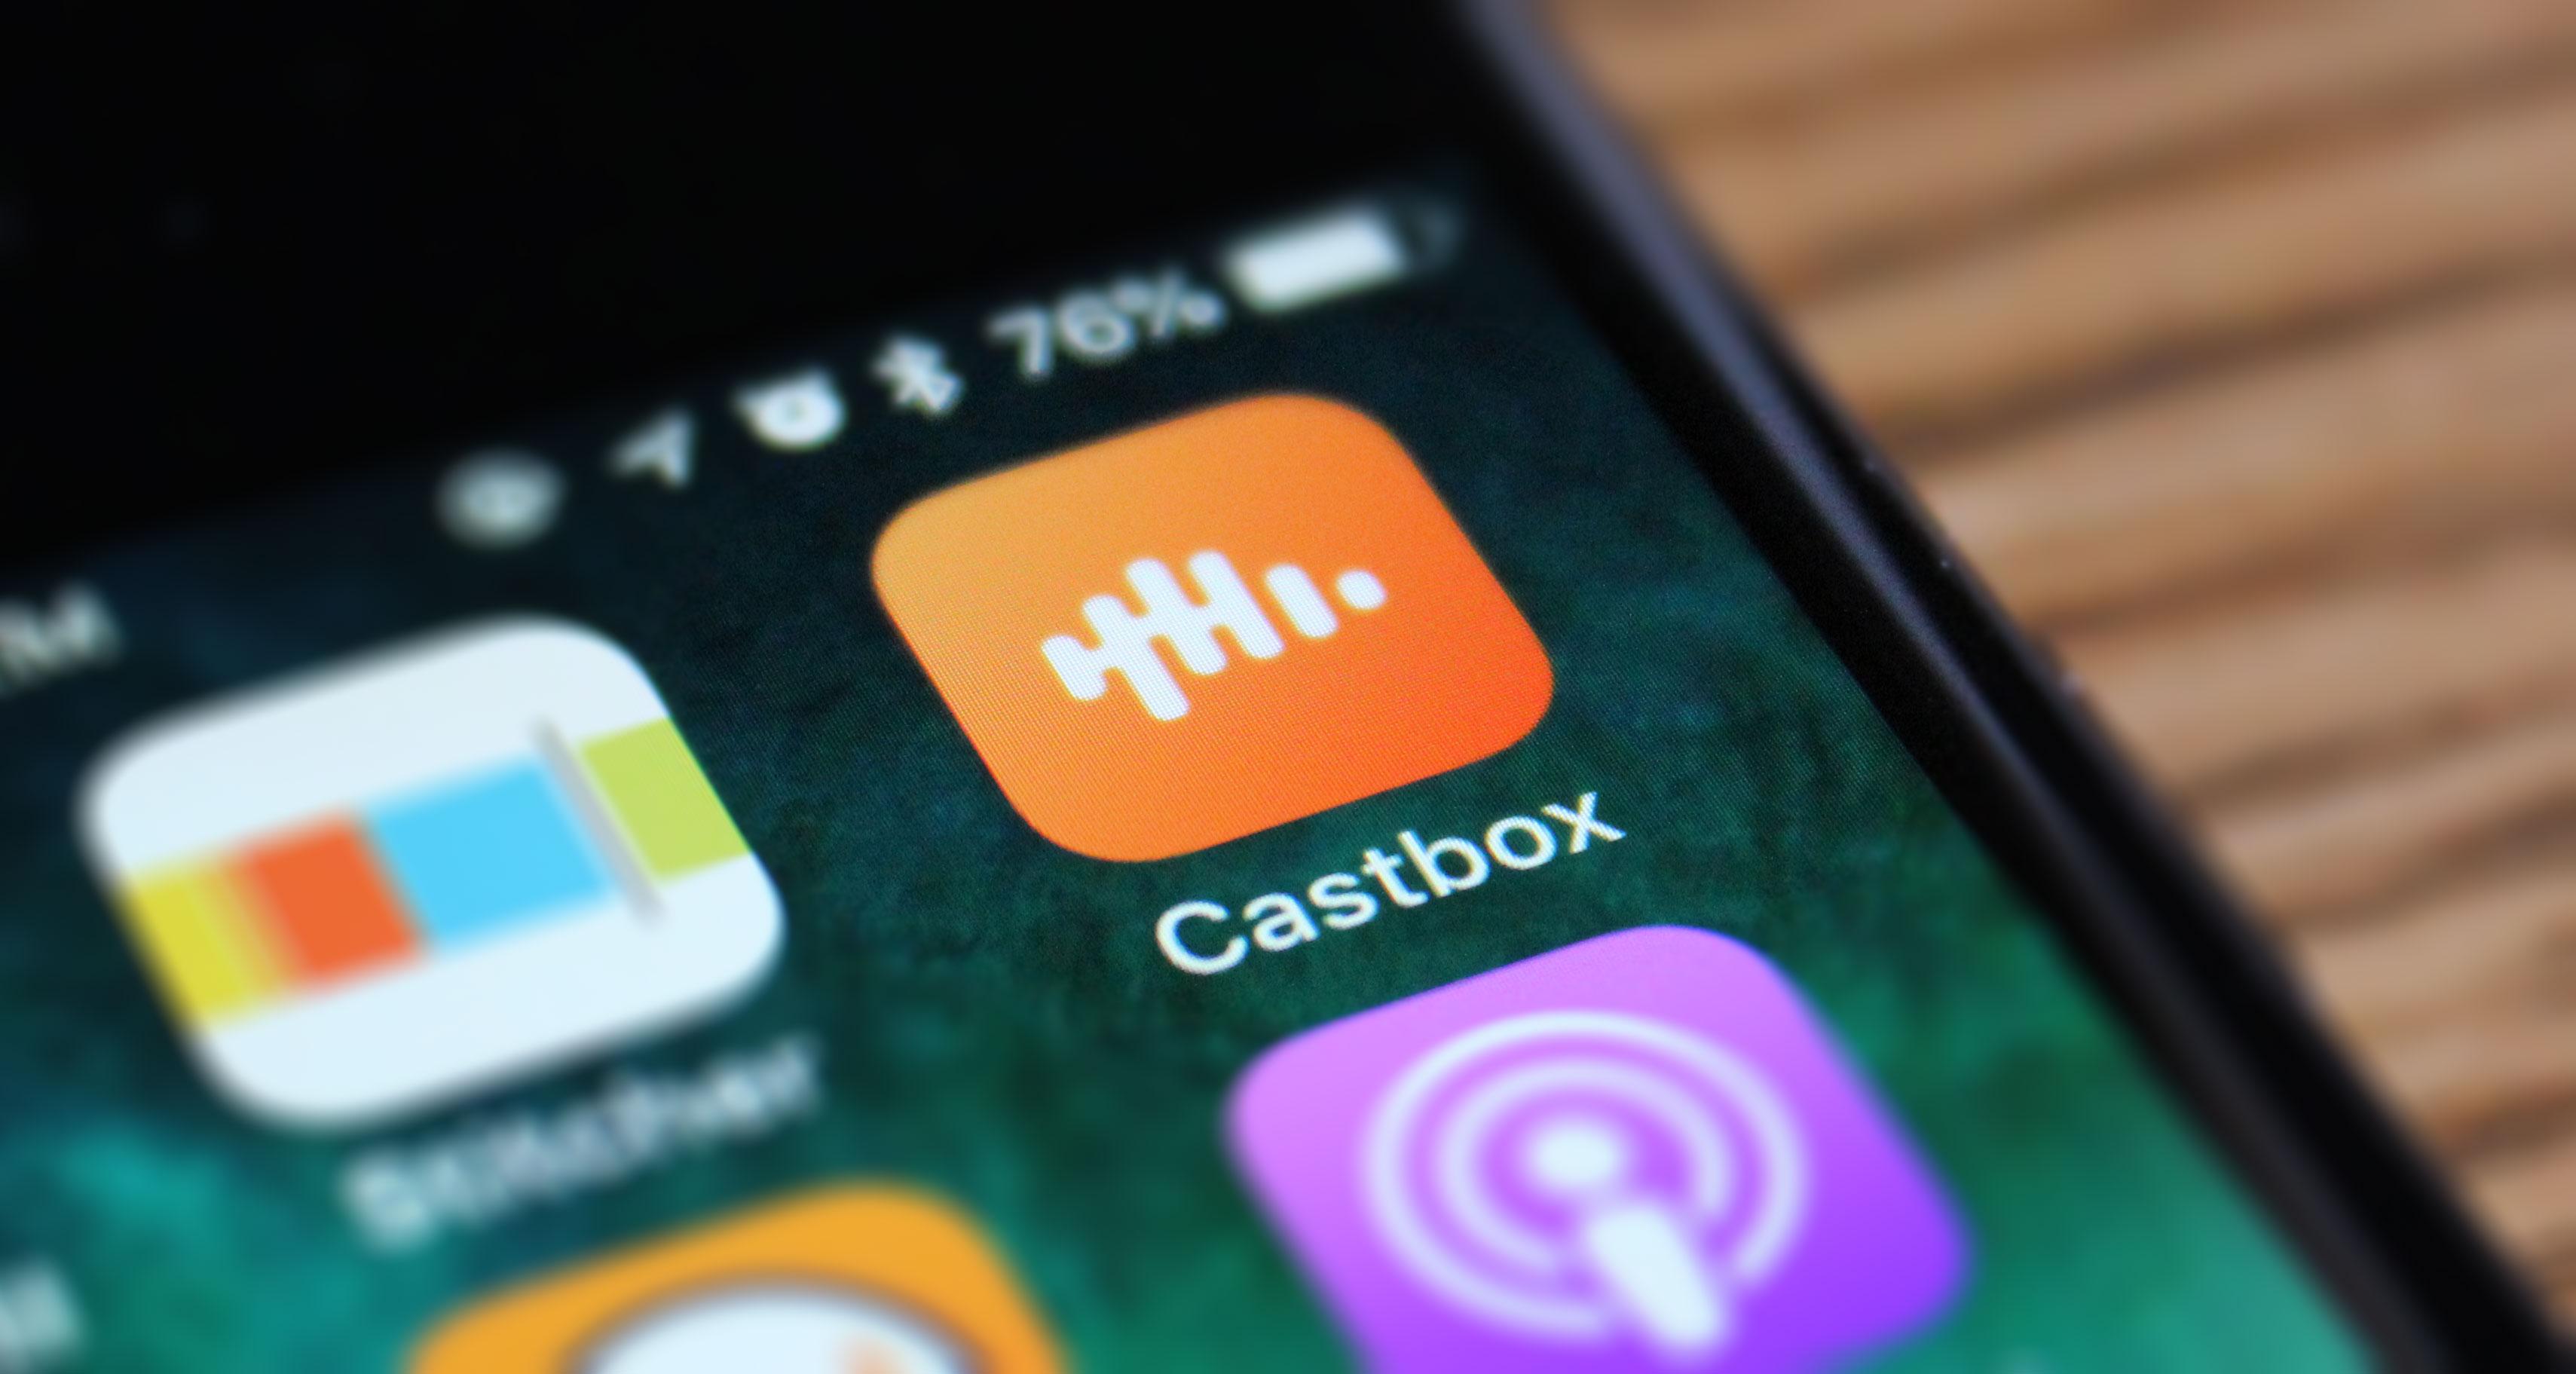 Podcast app Castbox raises $13.5 million, launches its own.